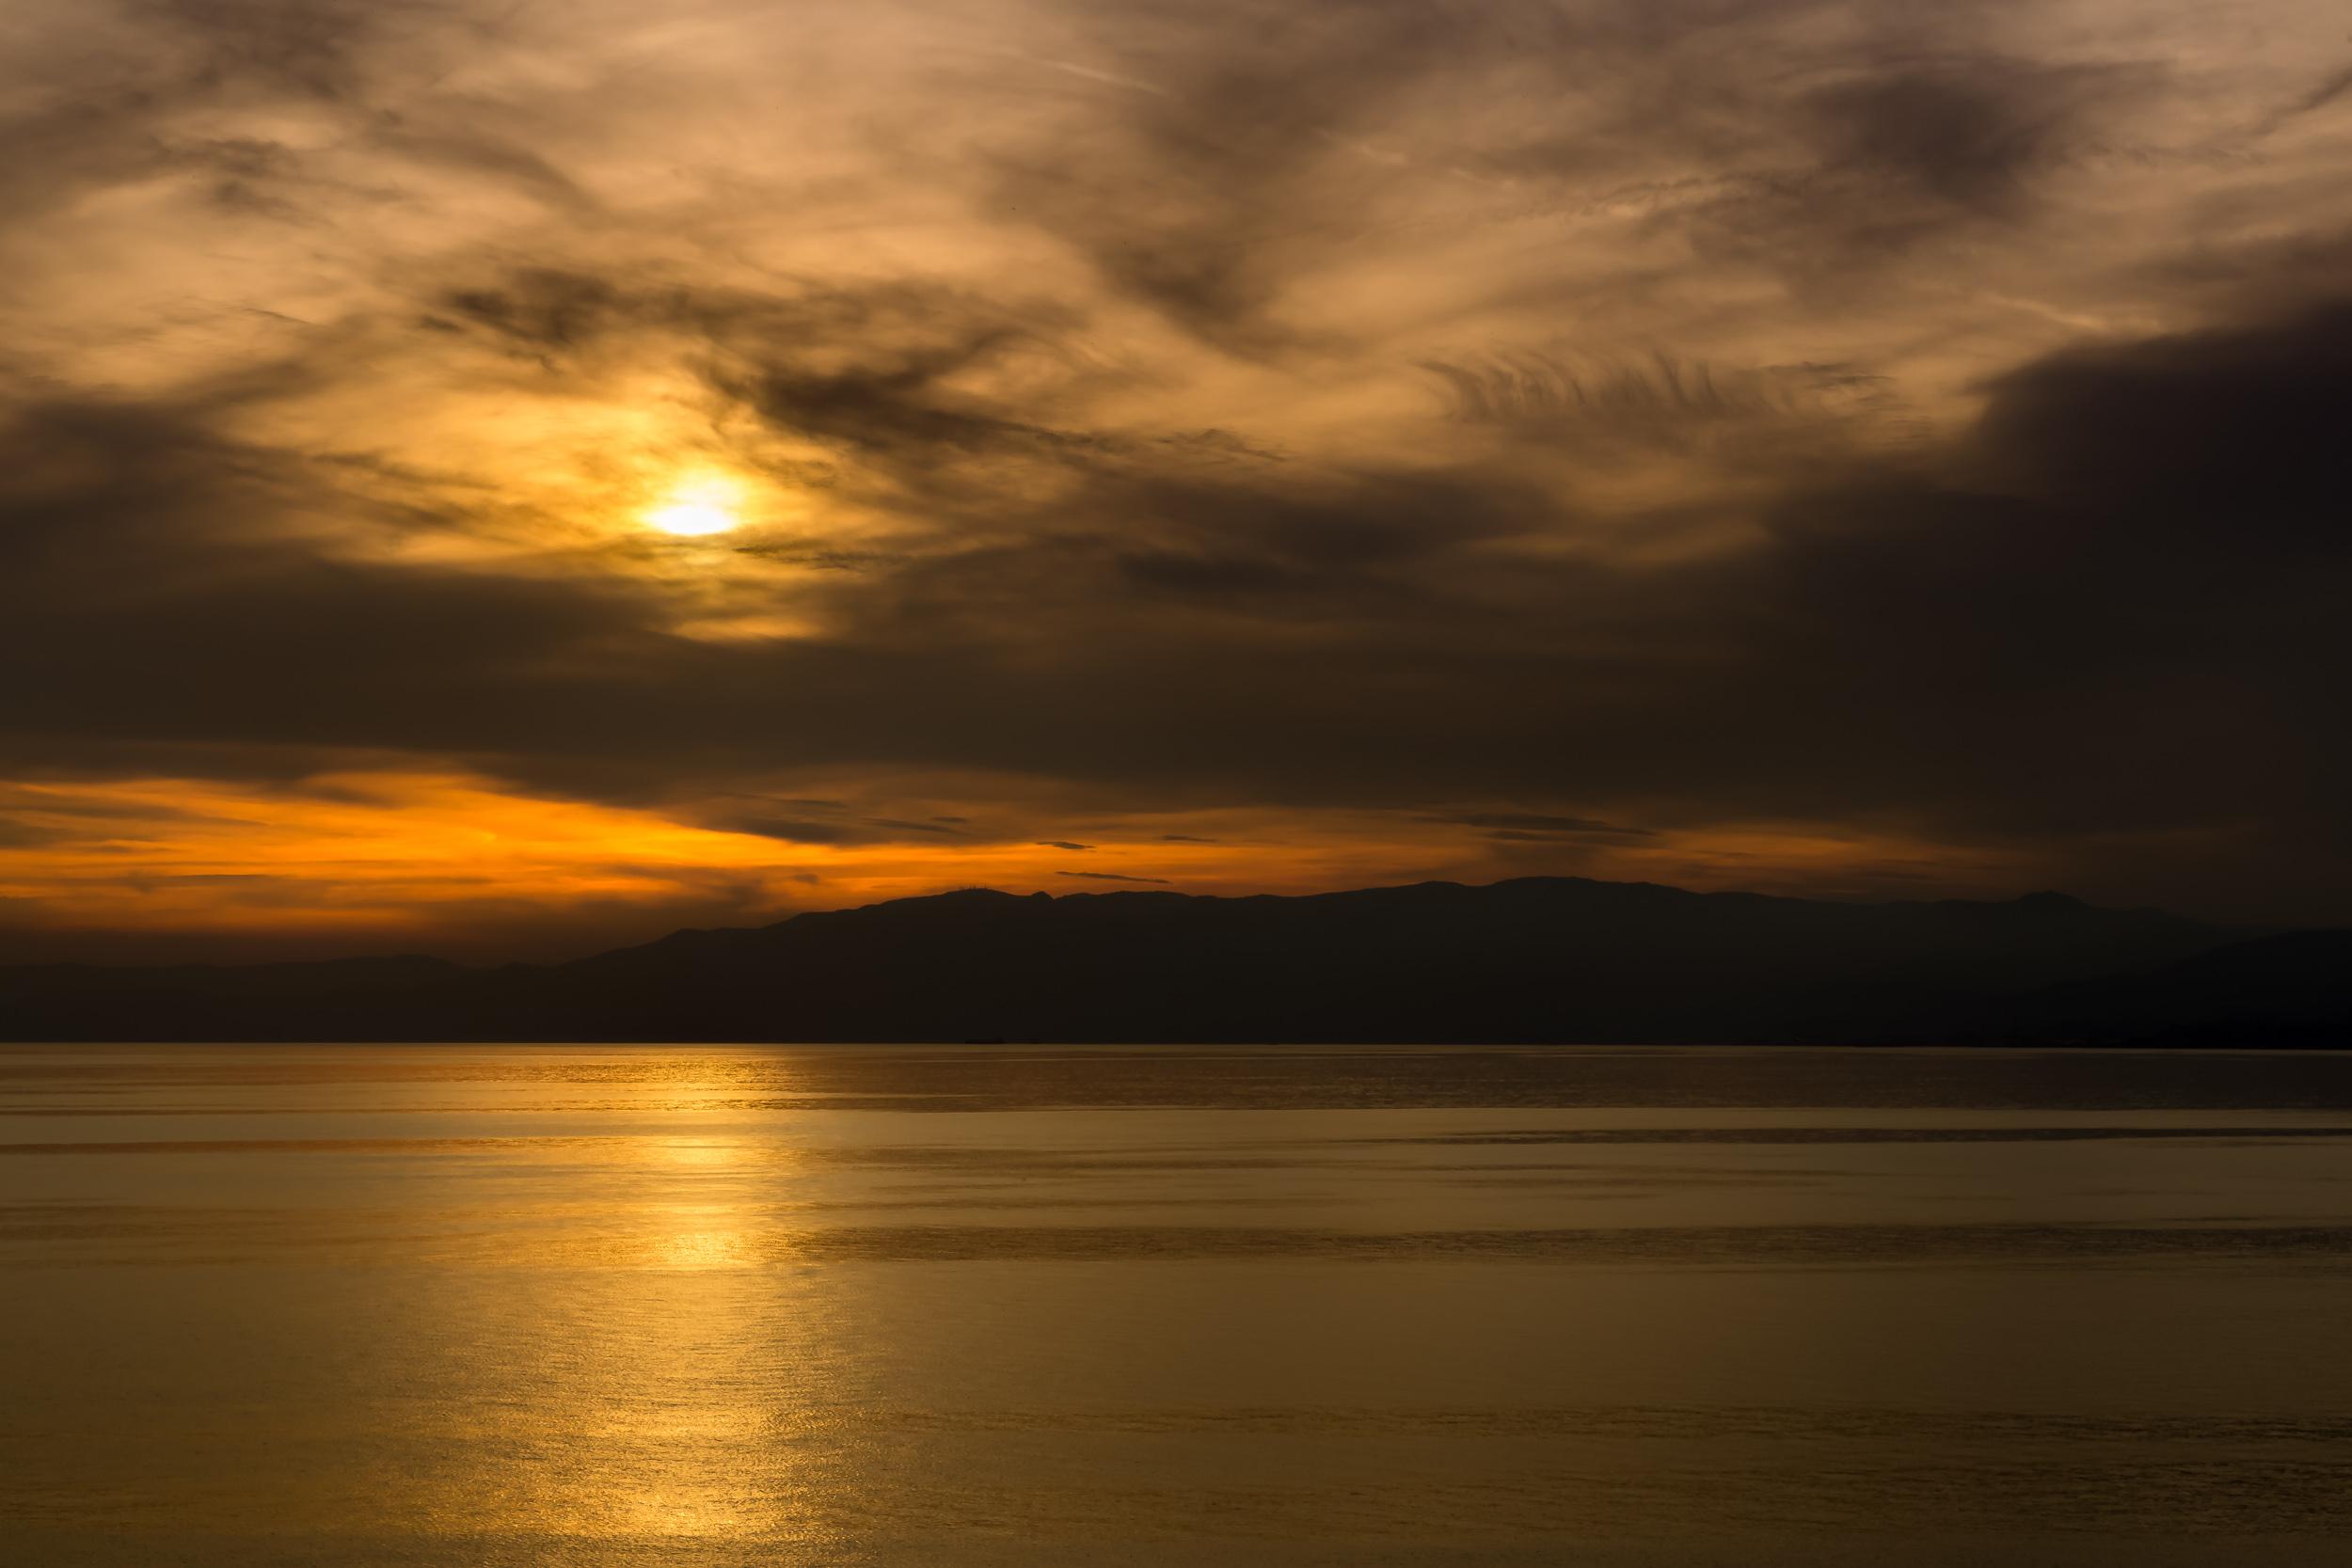 Sunset over Ligurian Alps